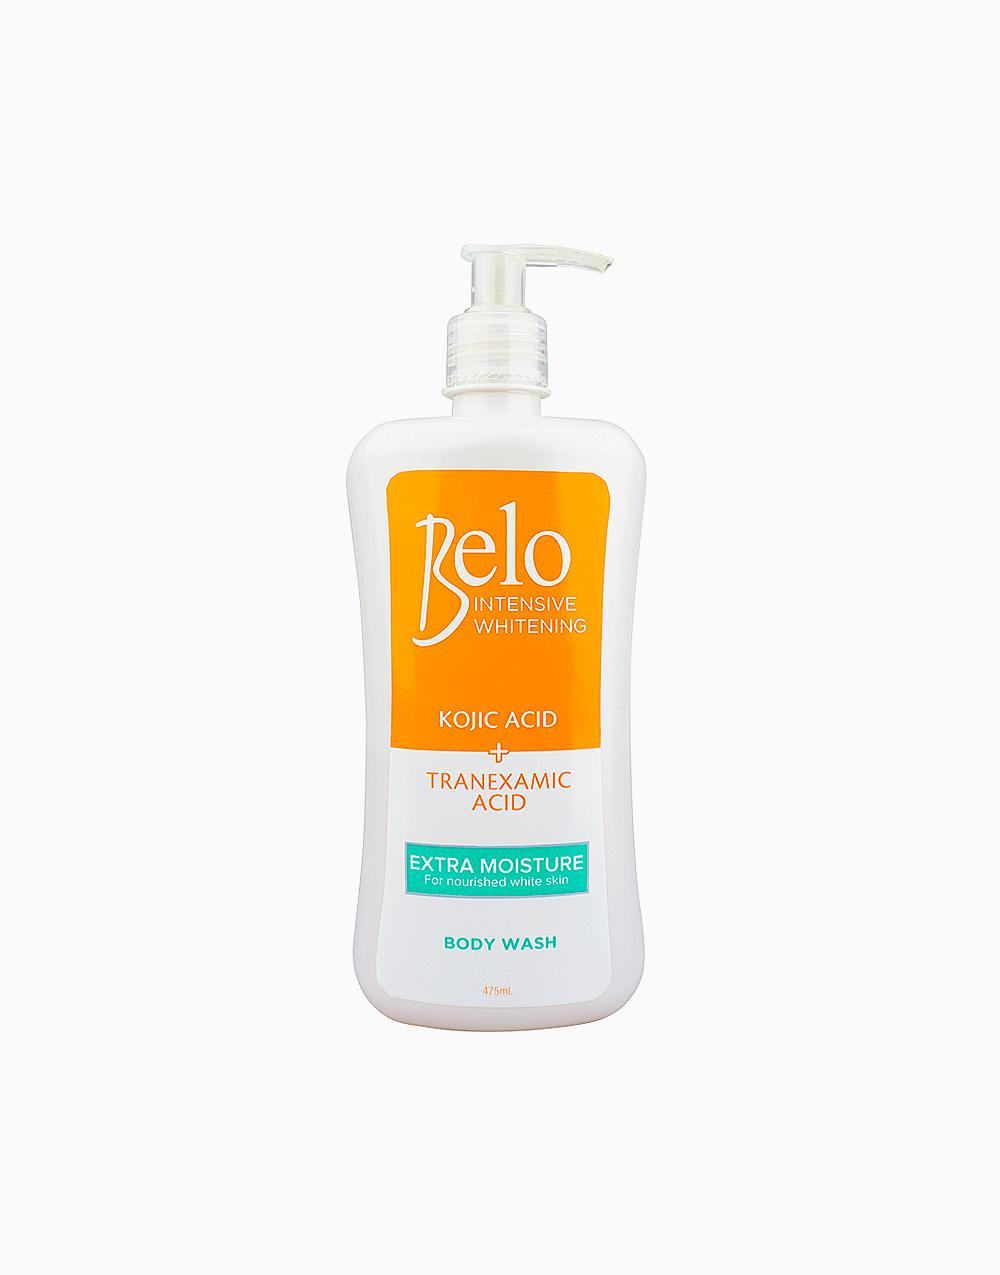 Belo Kojic Extra Moisture Body Wash (475ml) by Belo